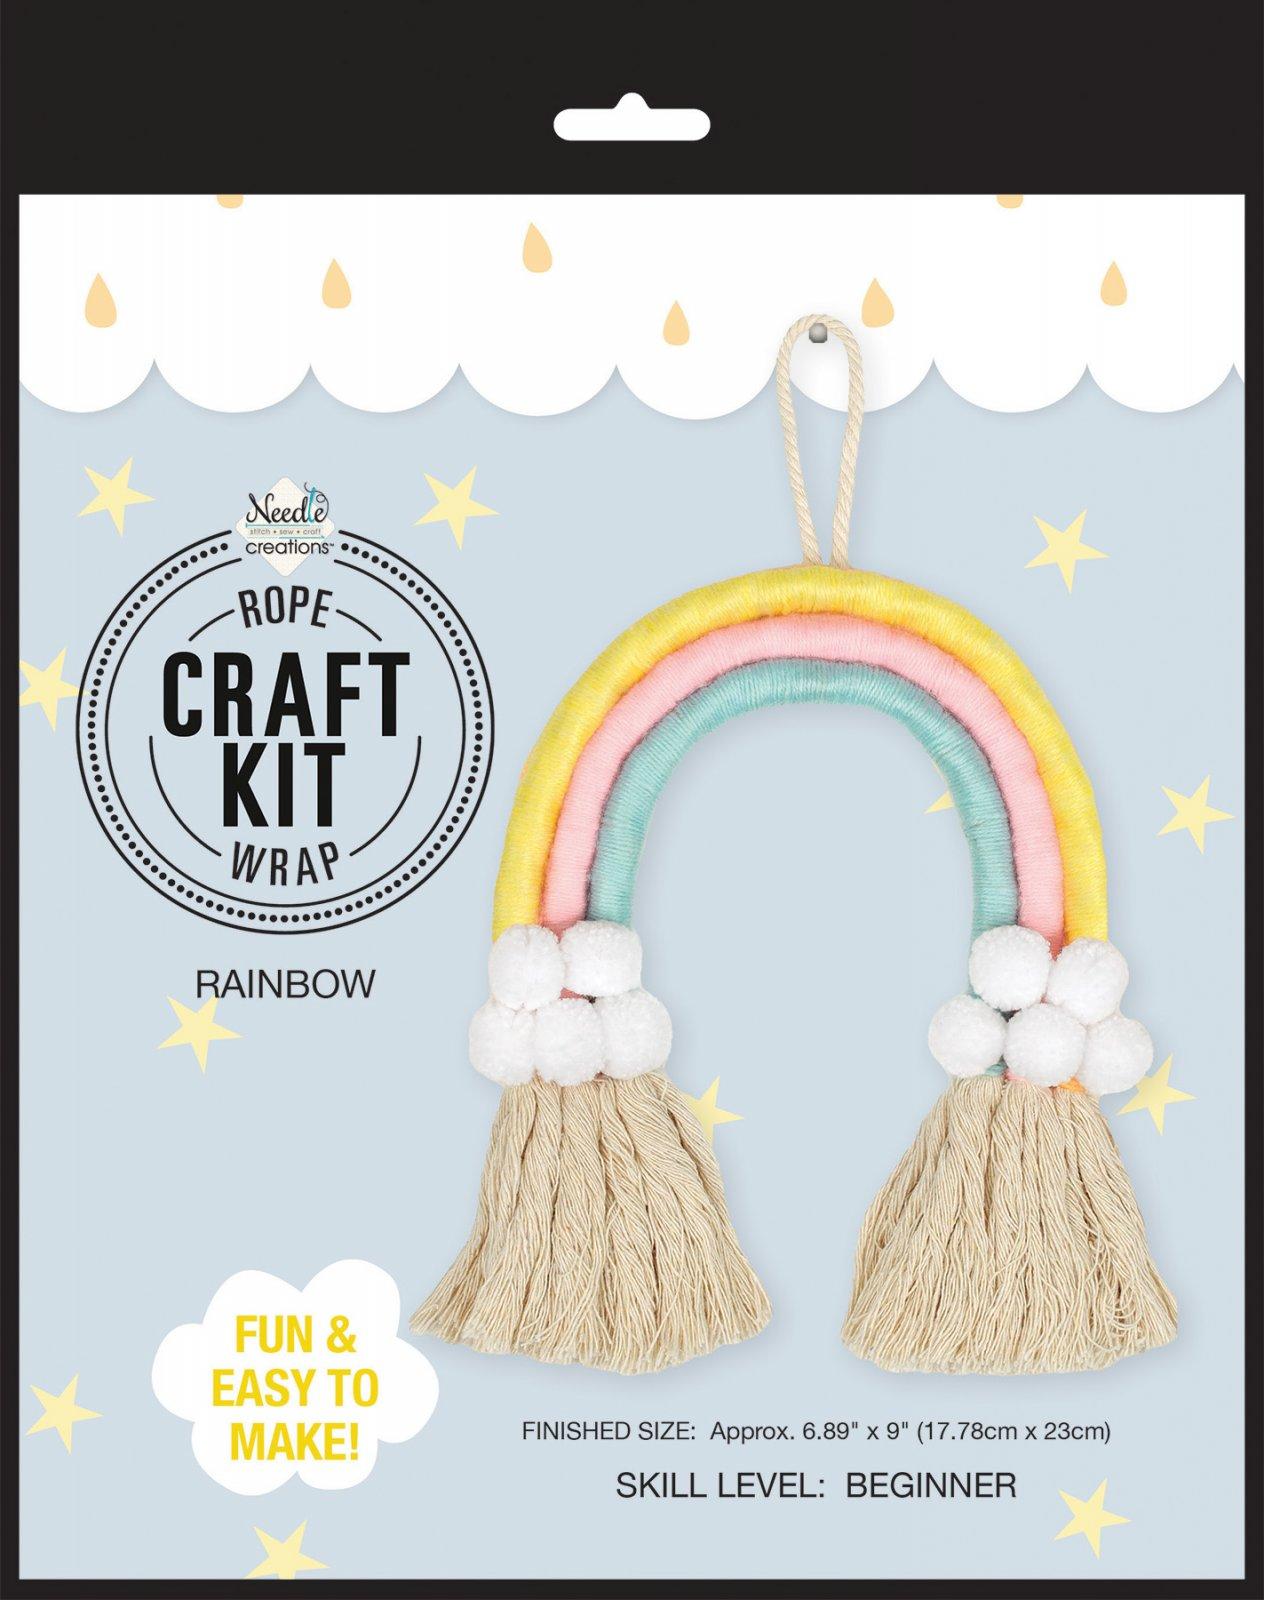 Needle Creations<br>Rope Wrap Craft Kit Rainbow<br>NC-DIYRNBWKT